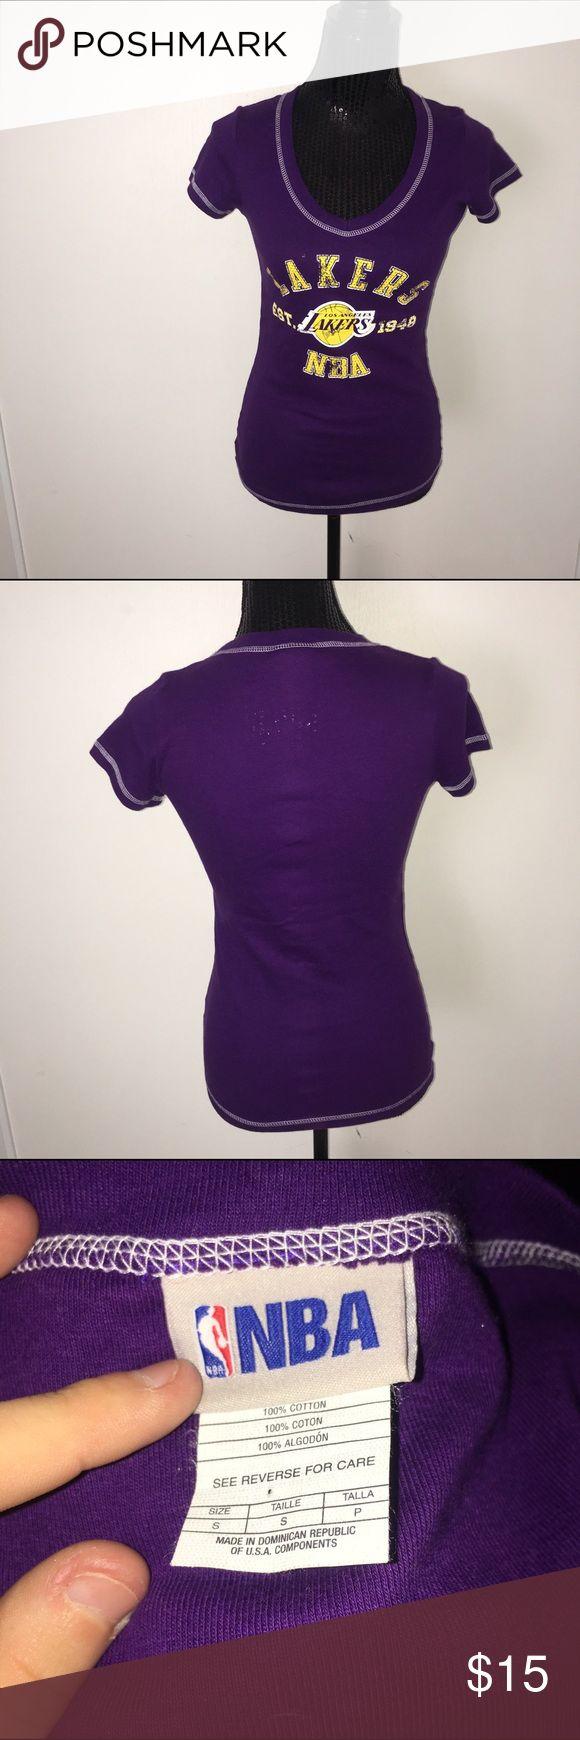 Small purple lakers shirt sleeve women's top So cute nba Tops Tees - Short Sleeve